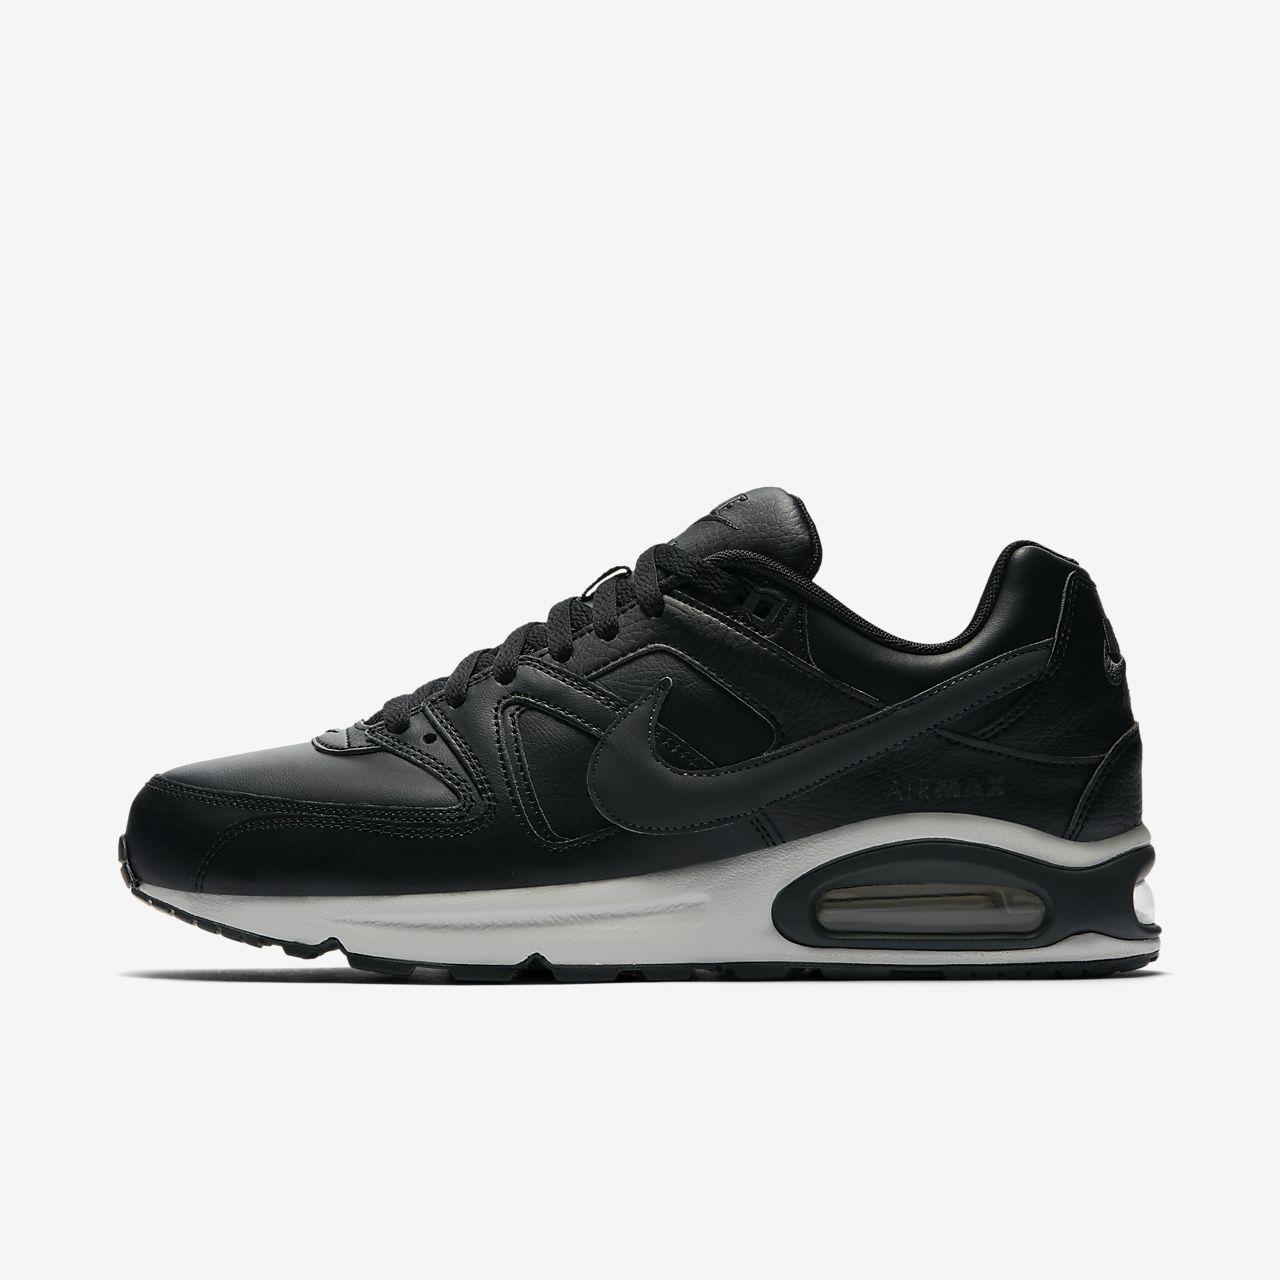 best website 09ee6 6bd4b ... Nike Air Max Command Erkek Ayakkabısı